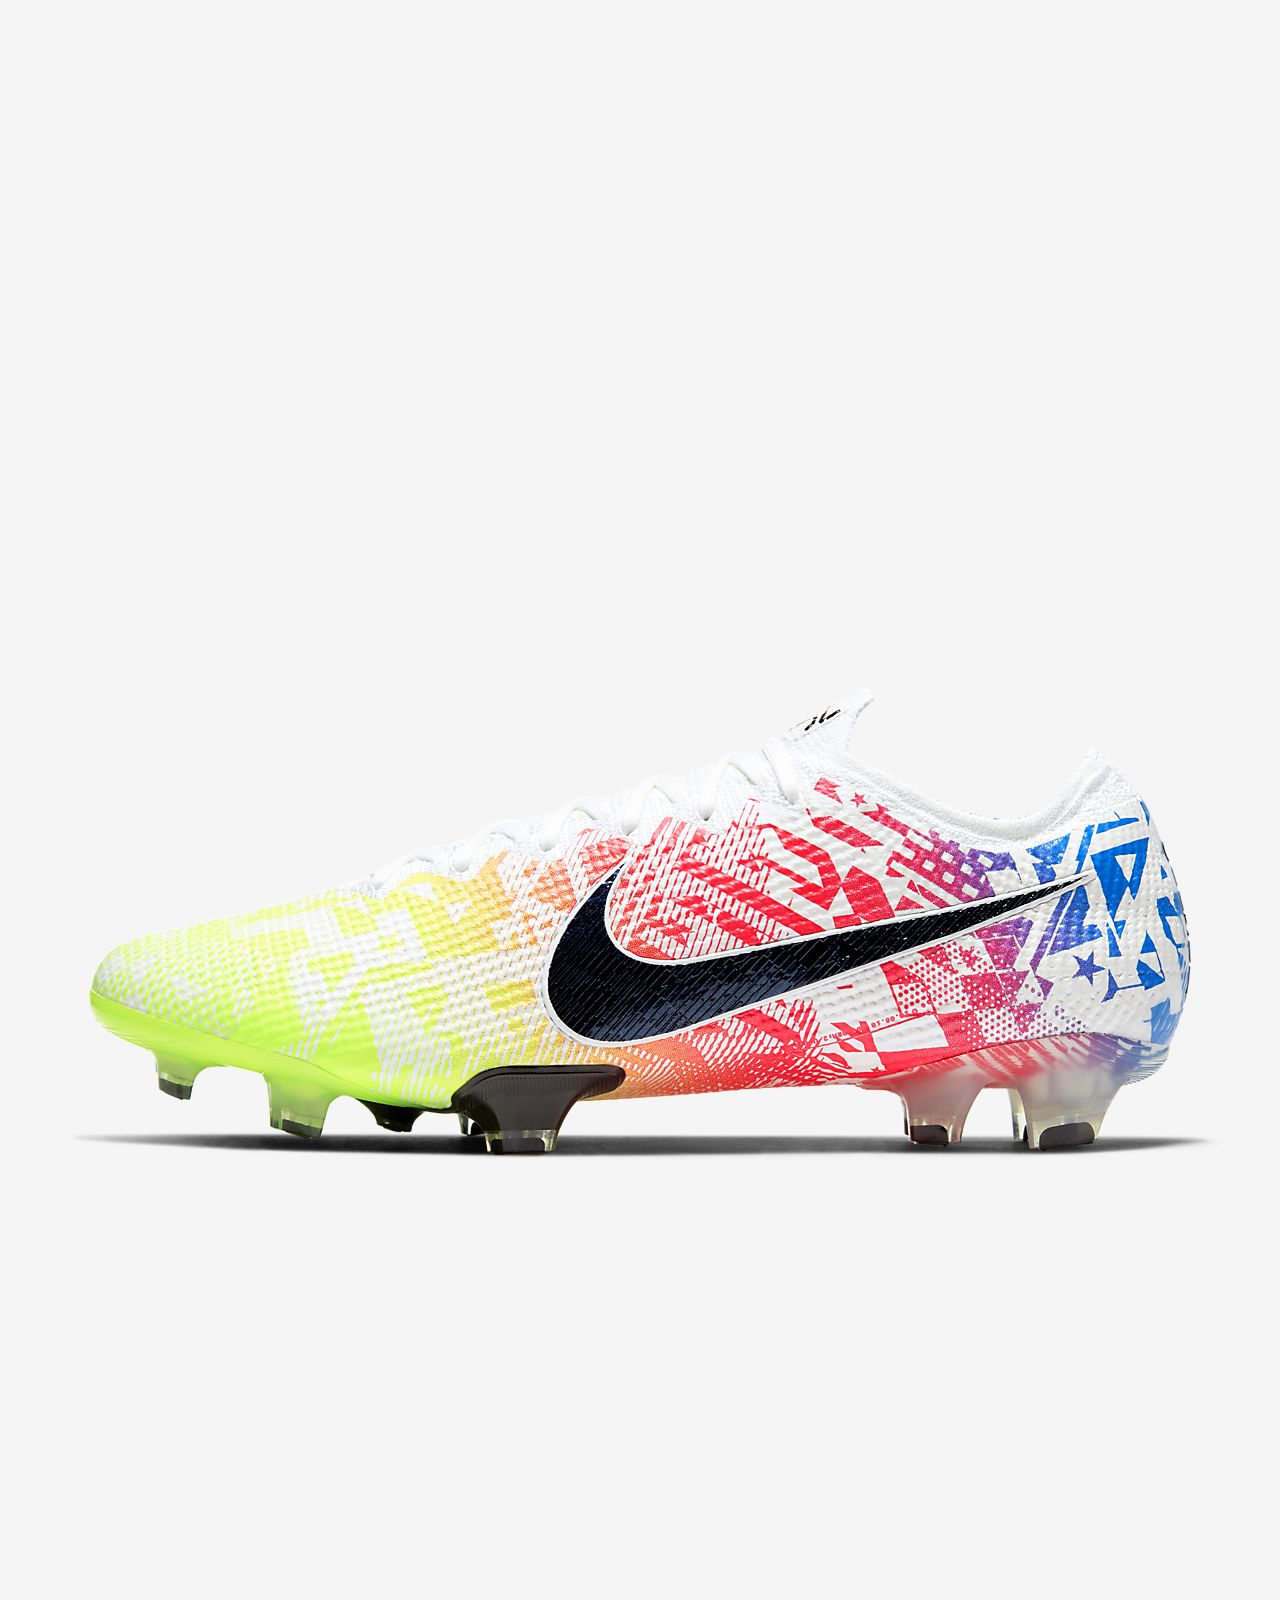 Nike Mercurial Vapor 13 Elite Neymar Jr. FG Firm-Ground Football Boot